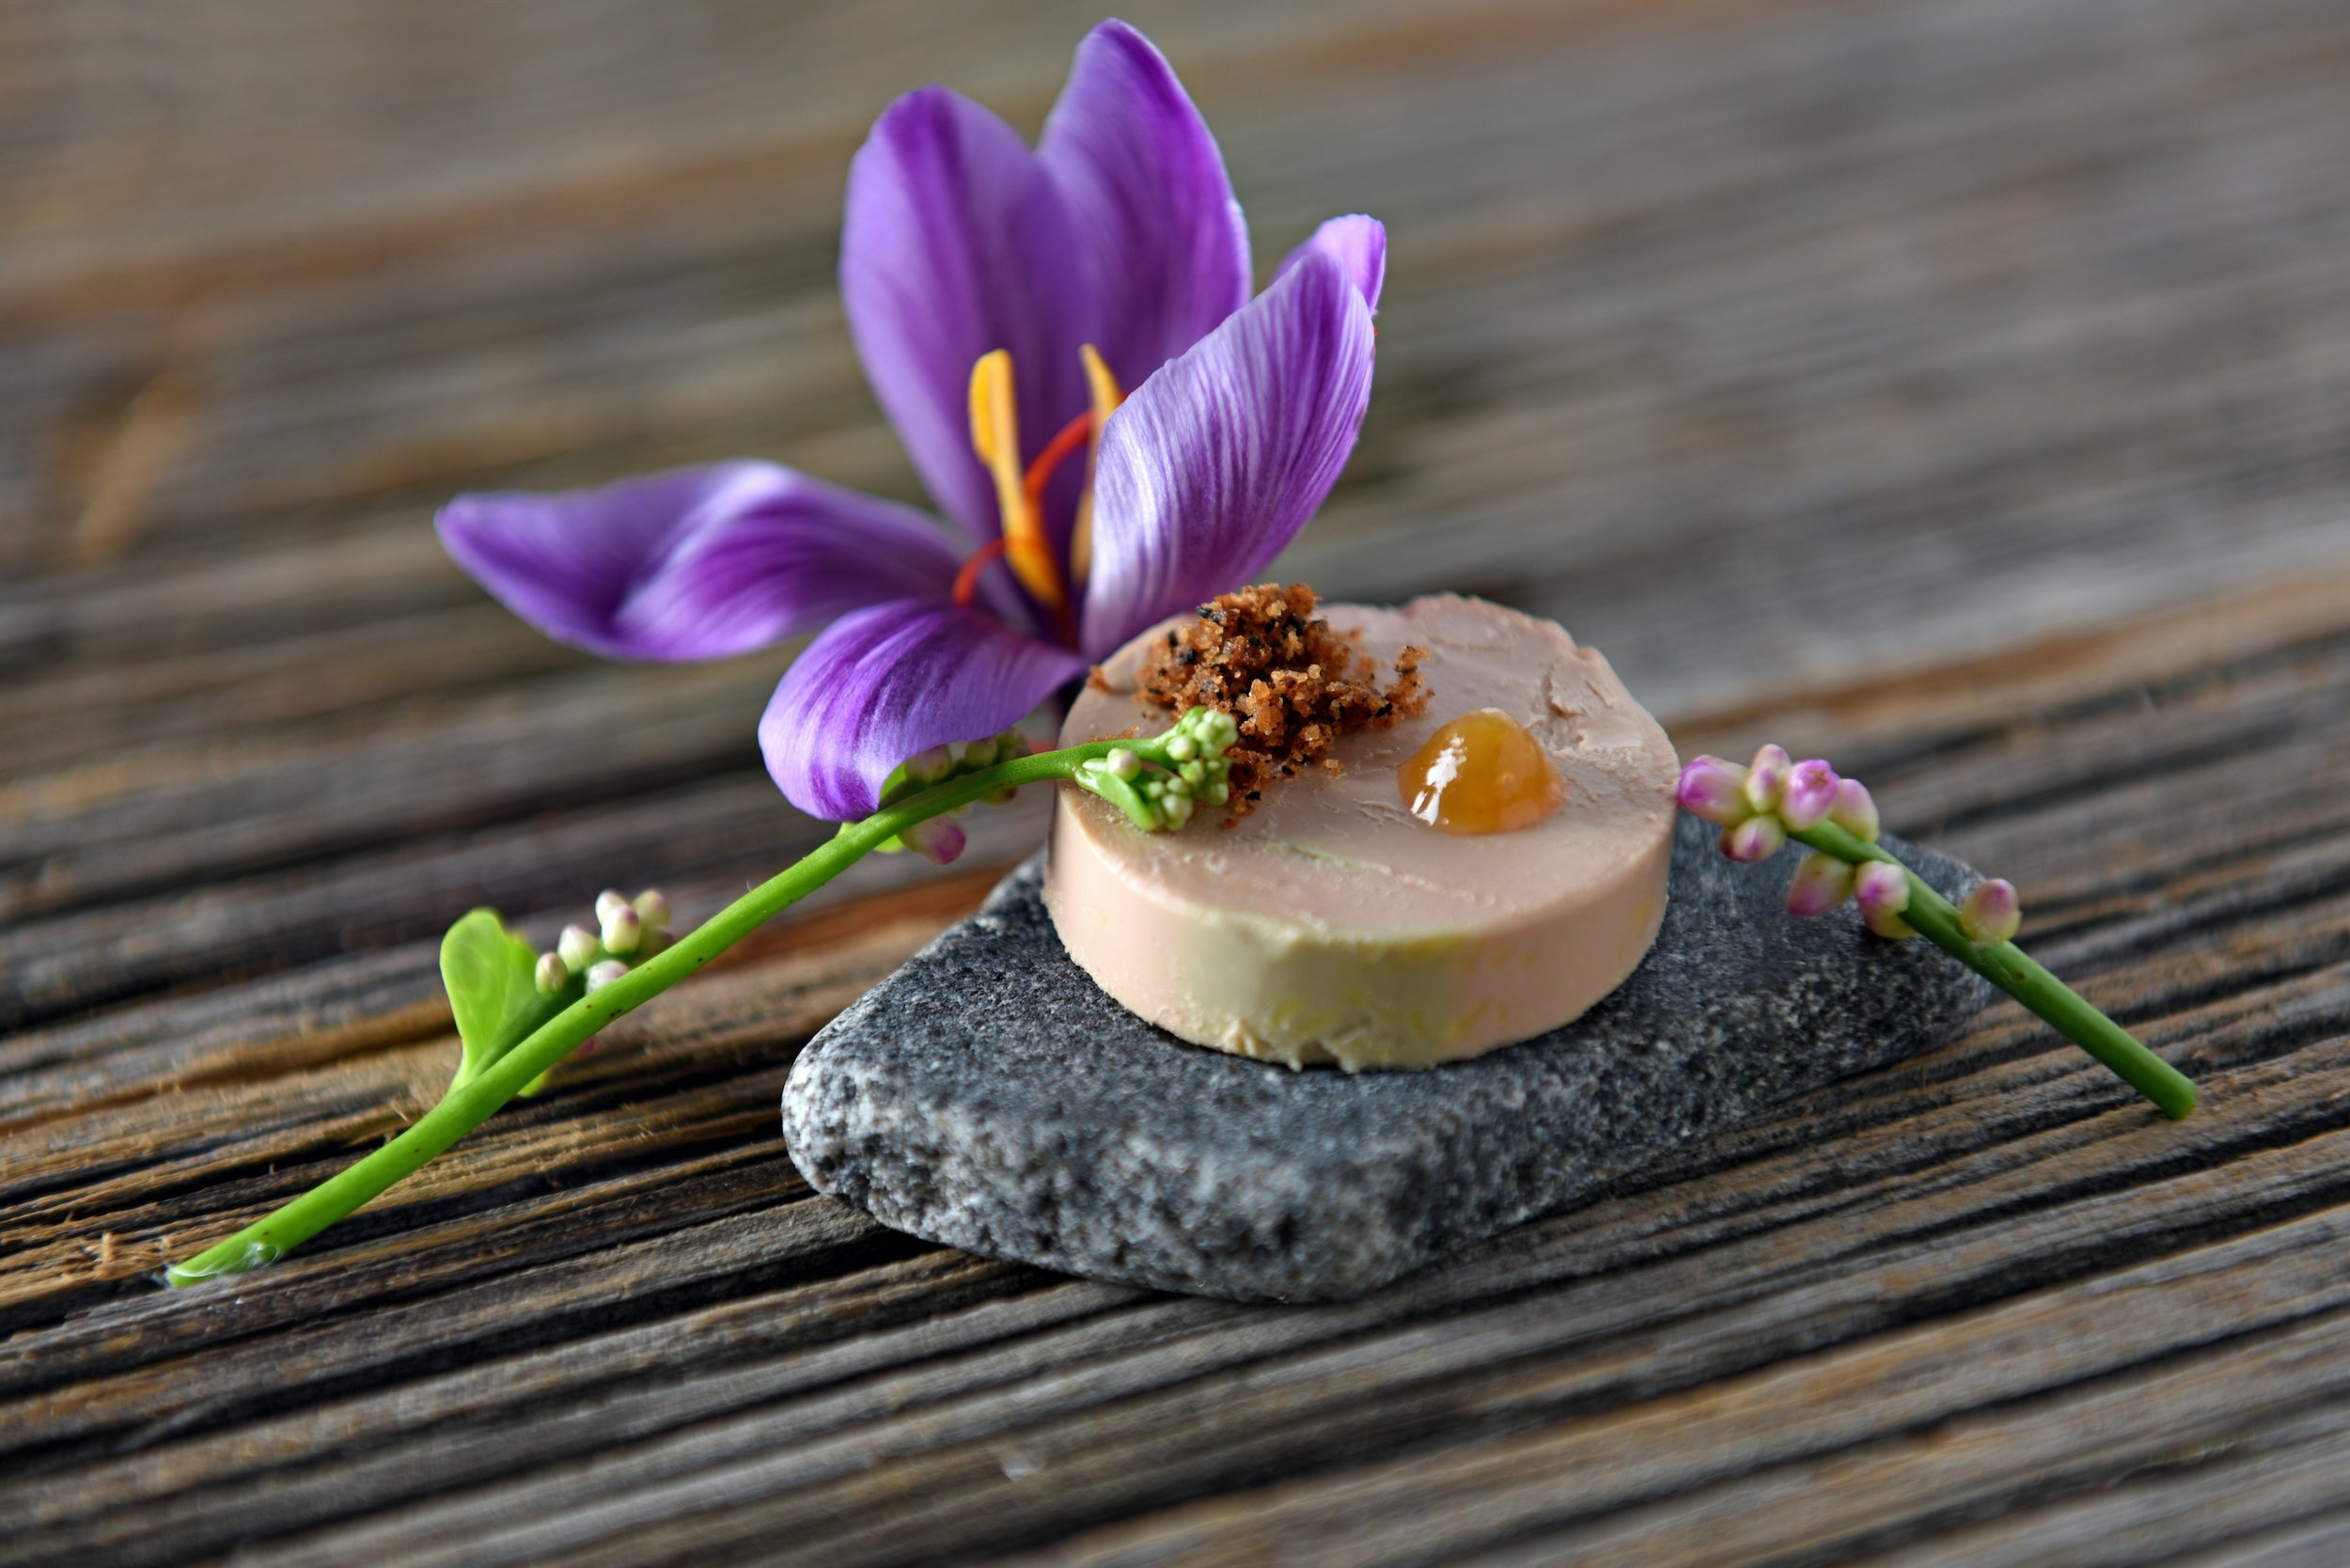 8 sofie s choice roeselare brasserie restaurant bart albrecht fotograaf food tablefever.jpg